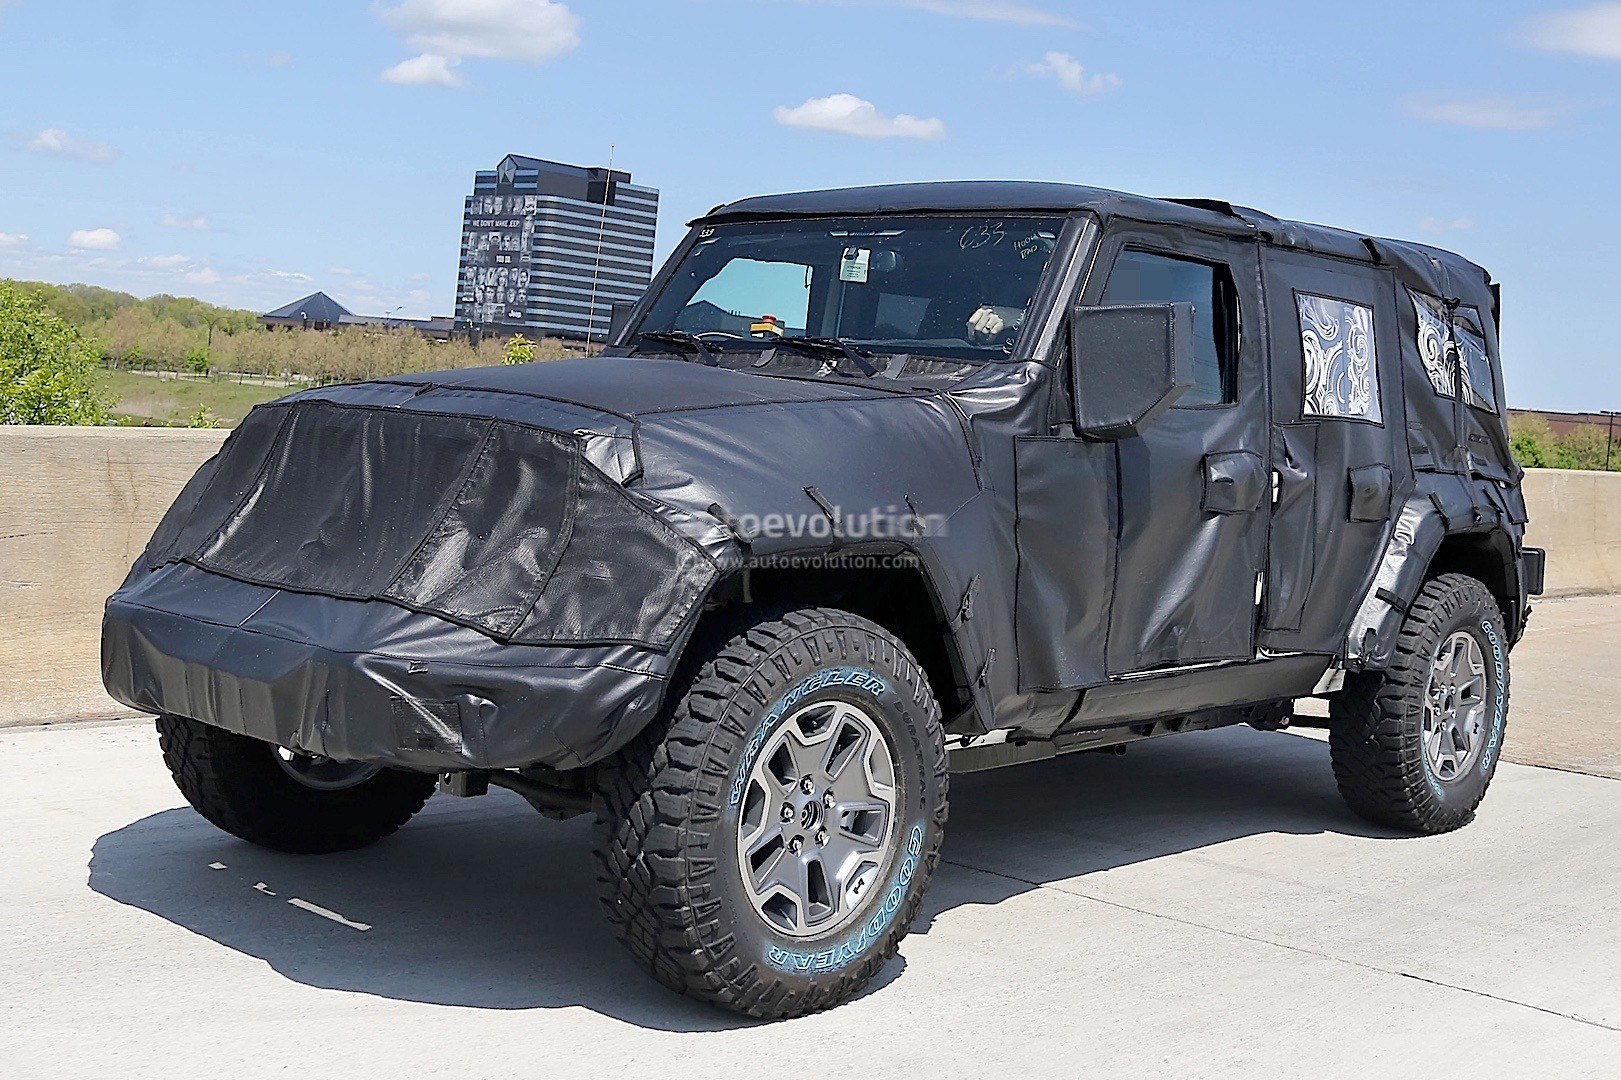 2018 jeep wrangler jl spied shows new hardware autoevolution. Black Bedroom Furniture Sets. Home Design Ideas